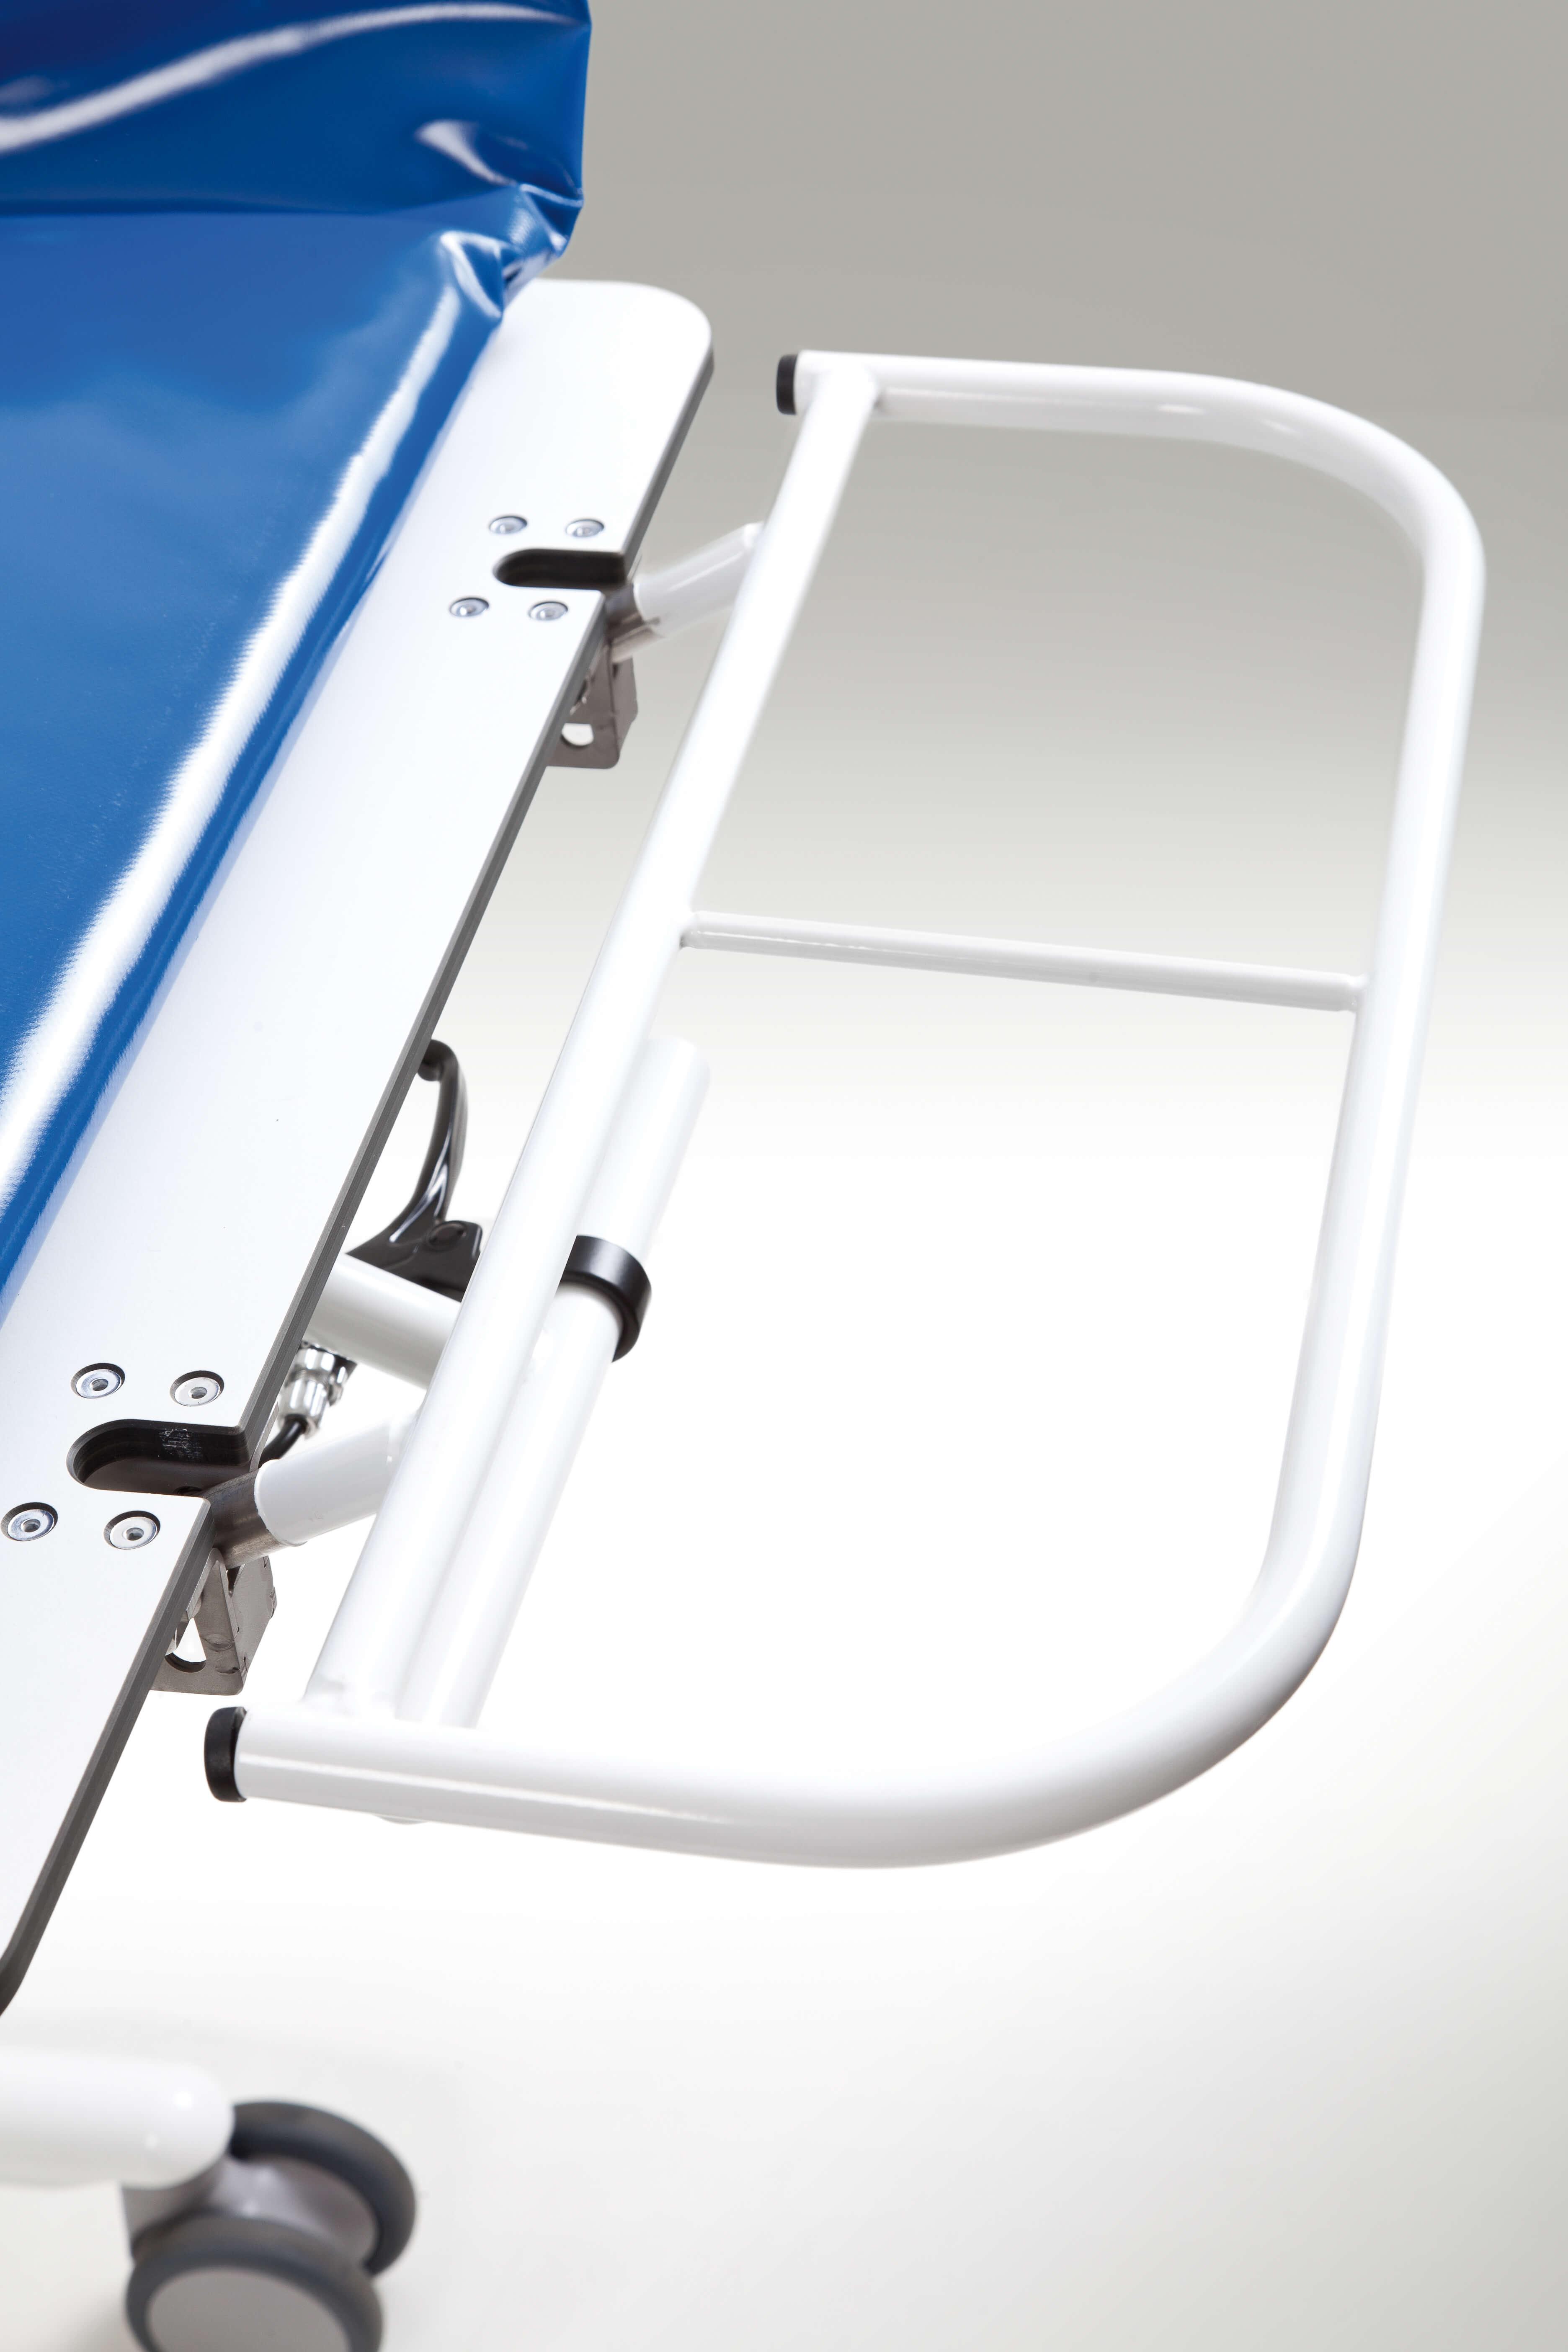 el dp medical ent shower endostrob trolley xion